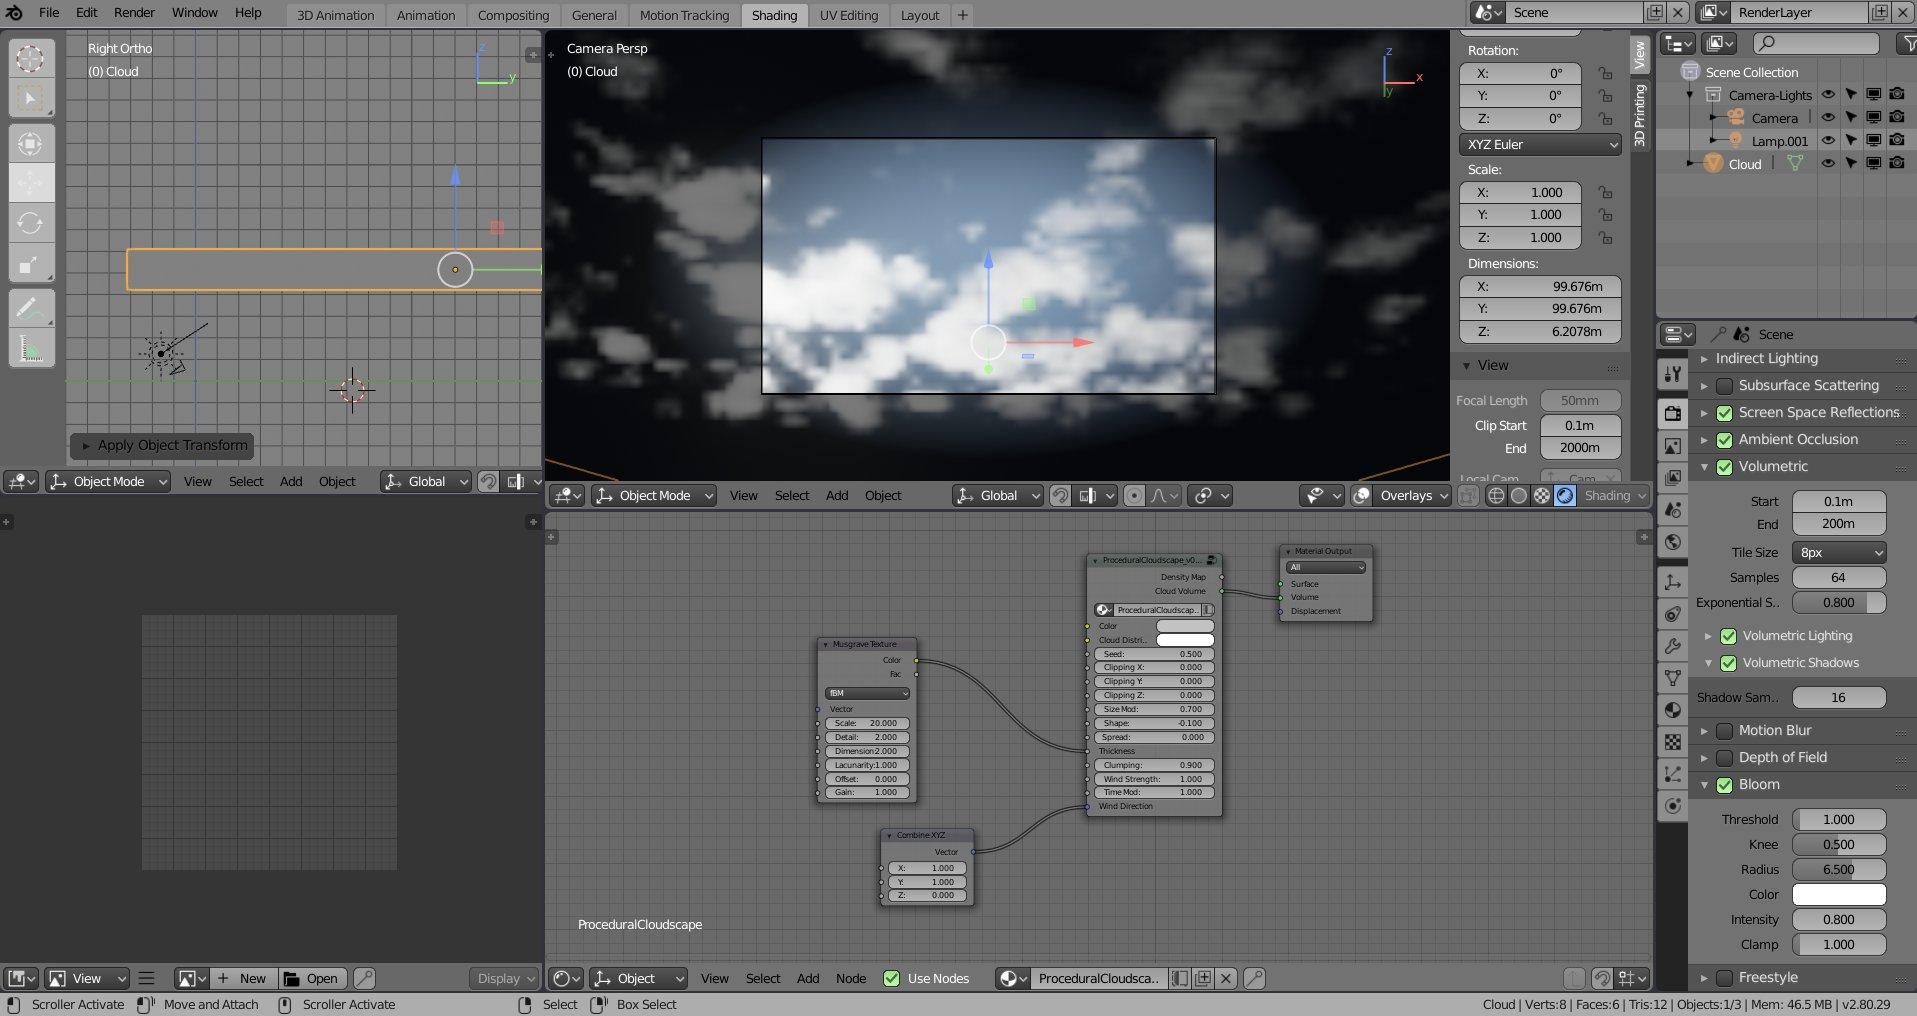 Procedural cloud system for Eevee